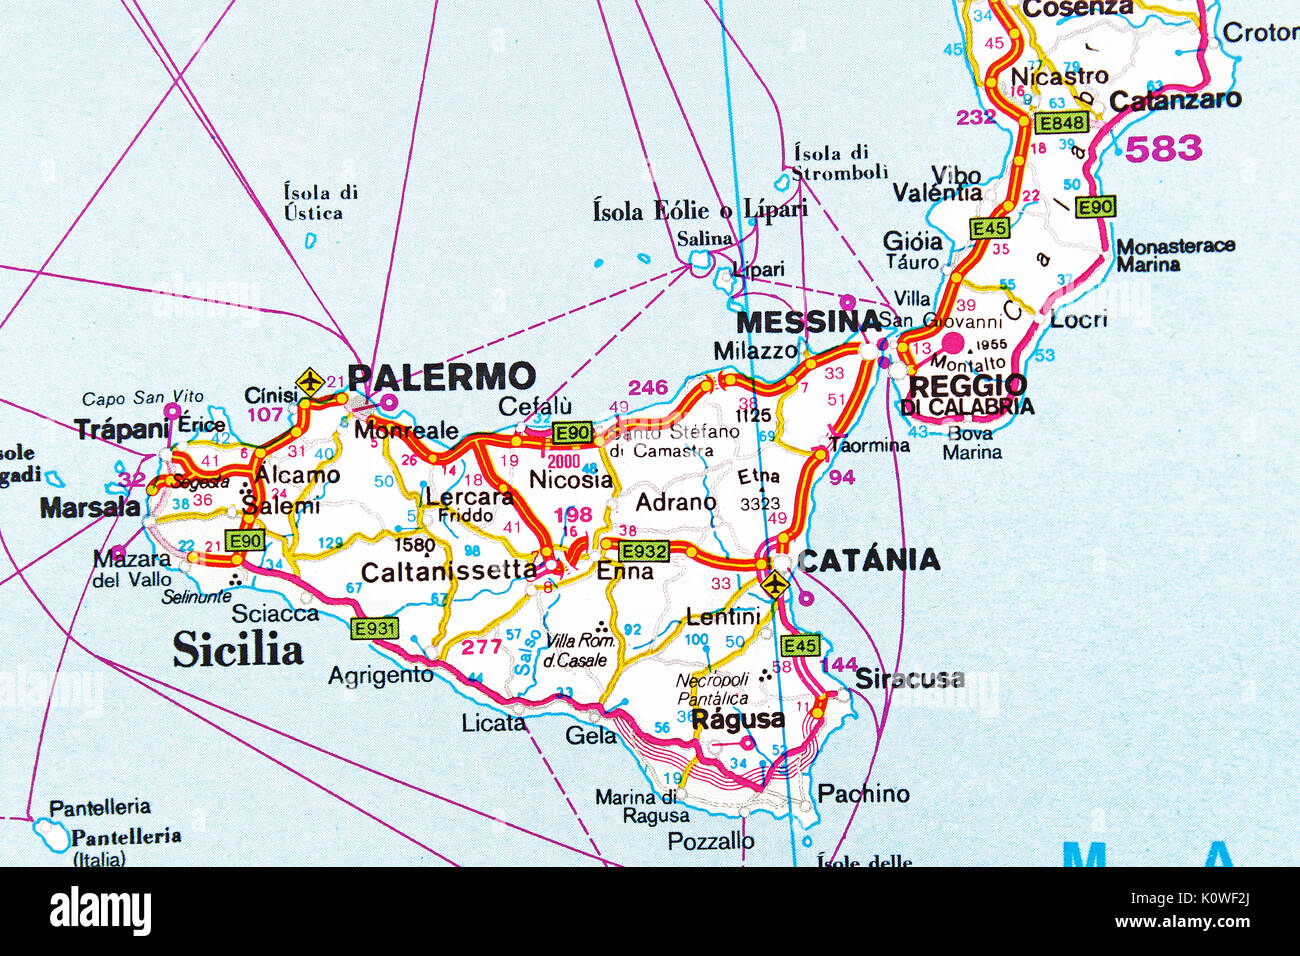 palermo mapa Palermo mapa ciudad Mapa Mapa de carreteras Foto & Imagen De Stock  palermo mapa